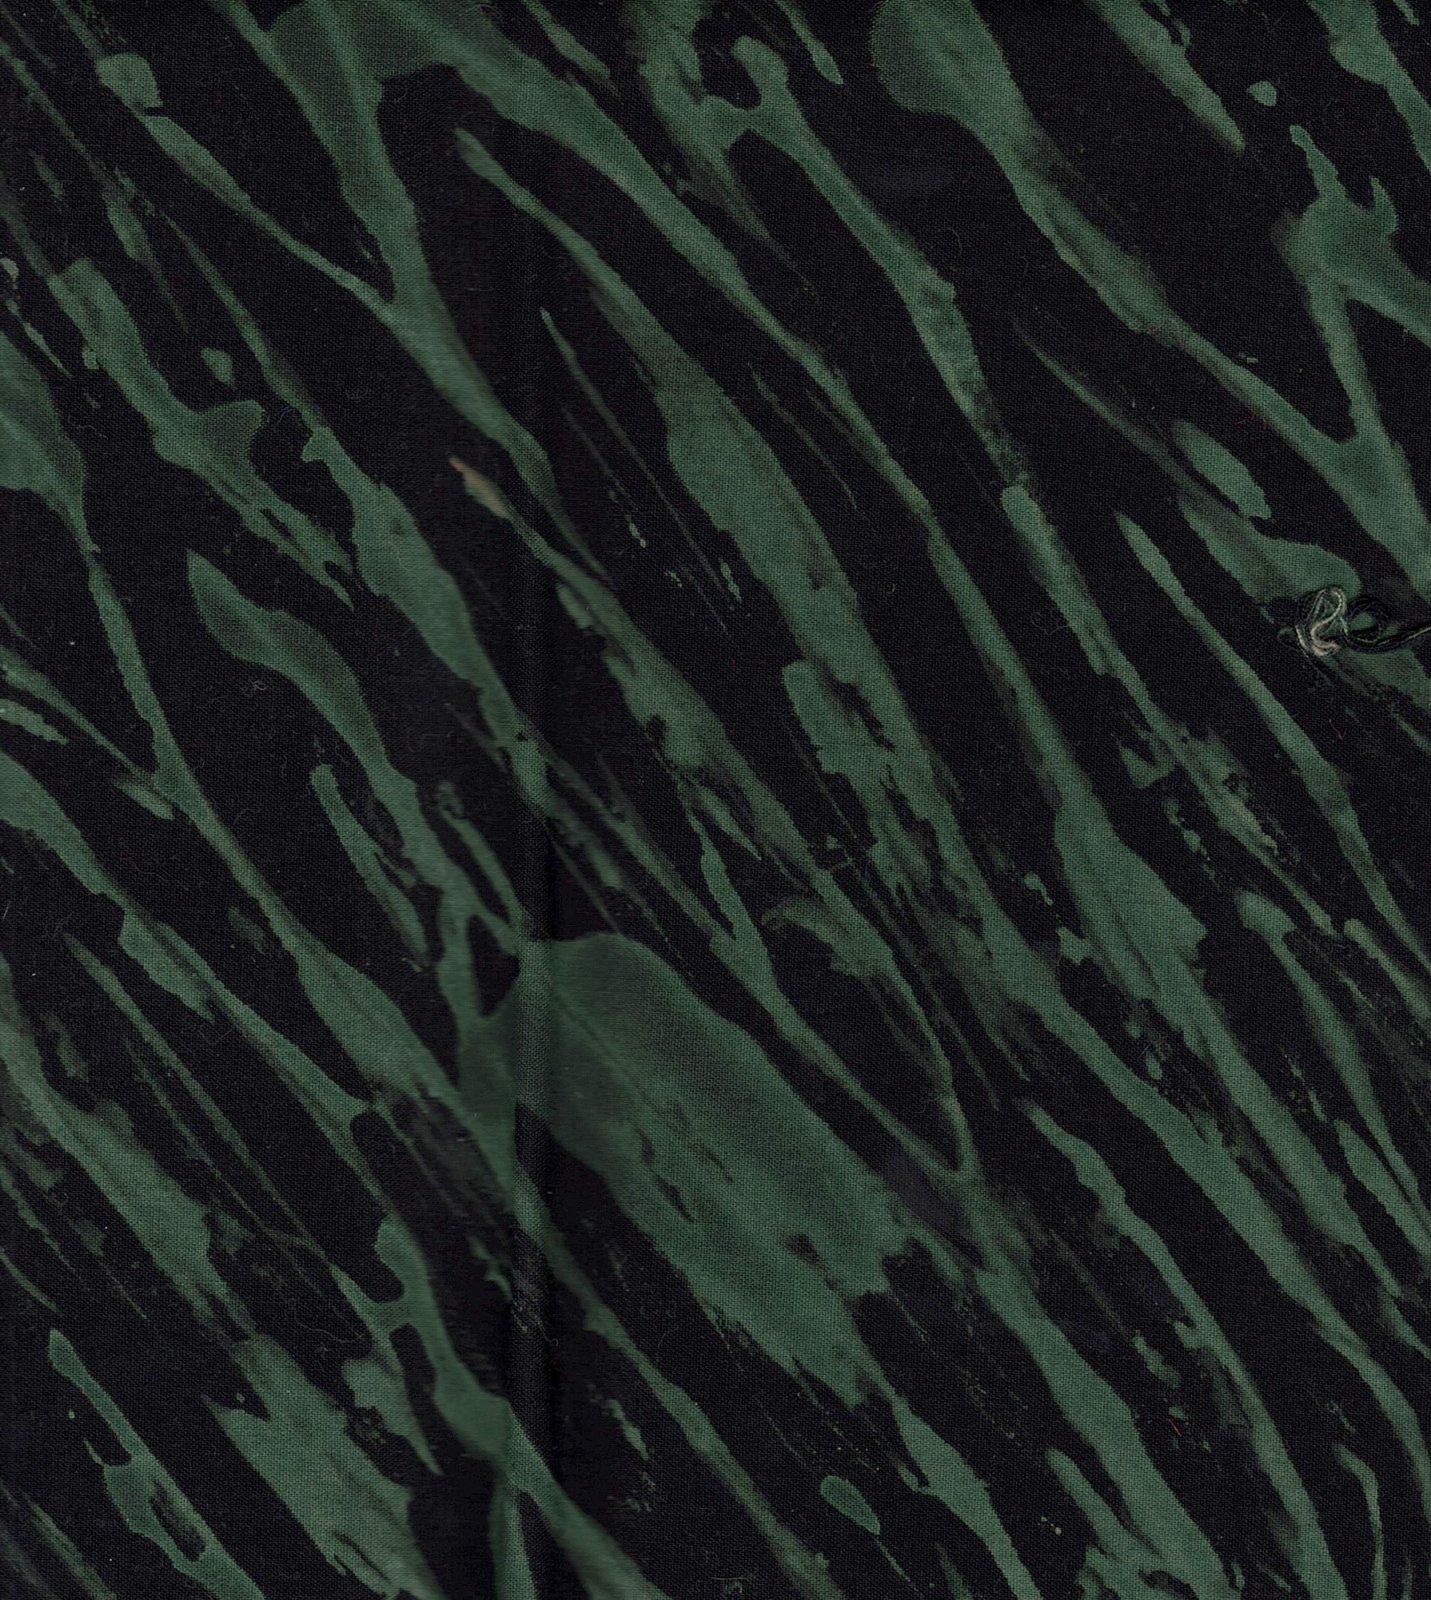 Black/Green Pole Wrap Shibori FQ